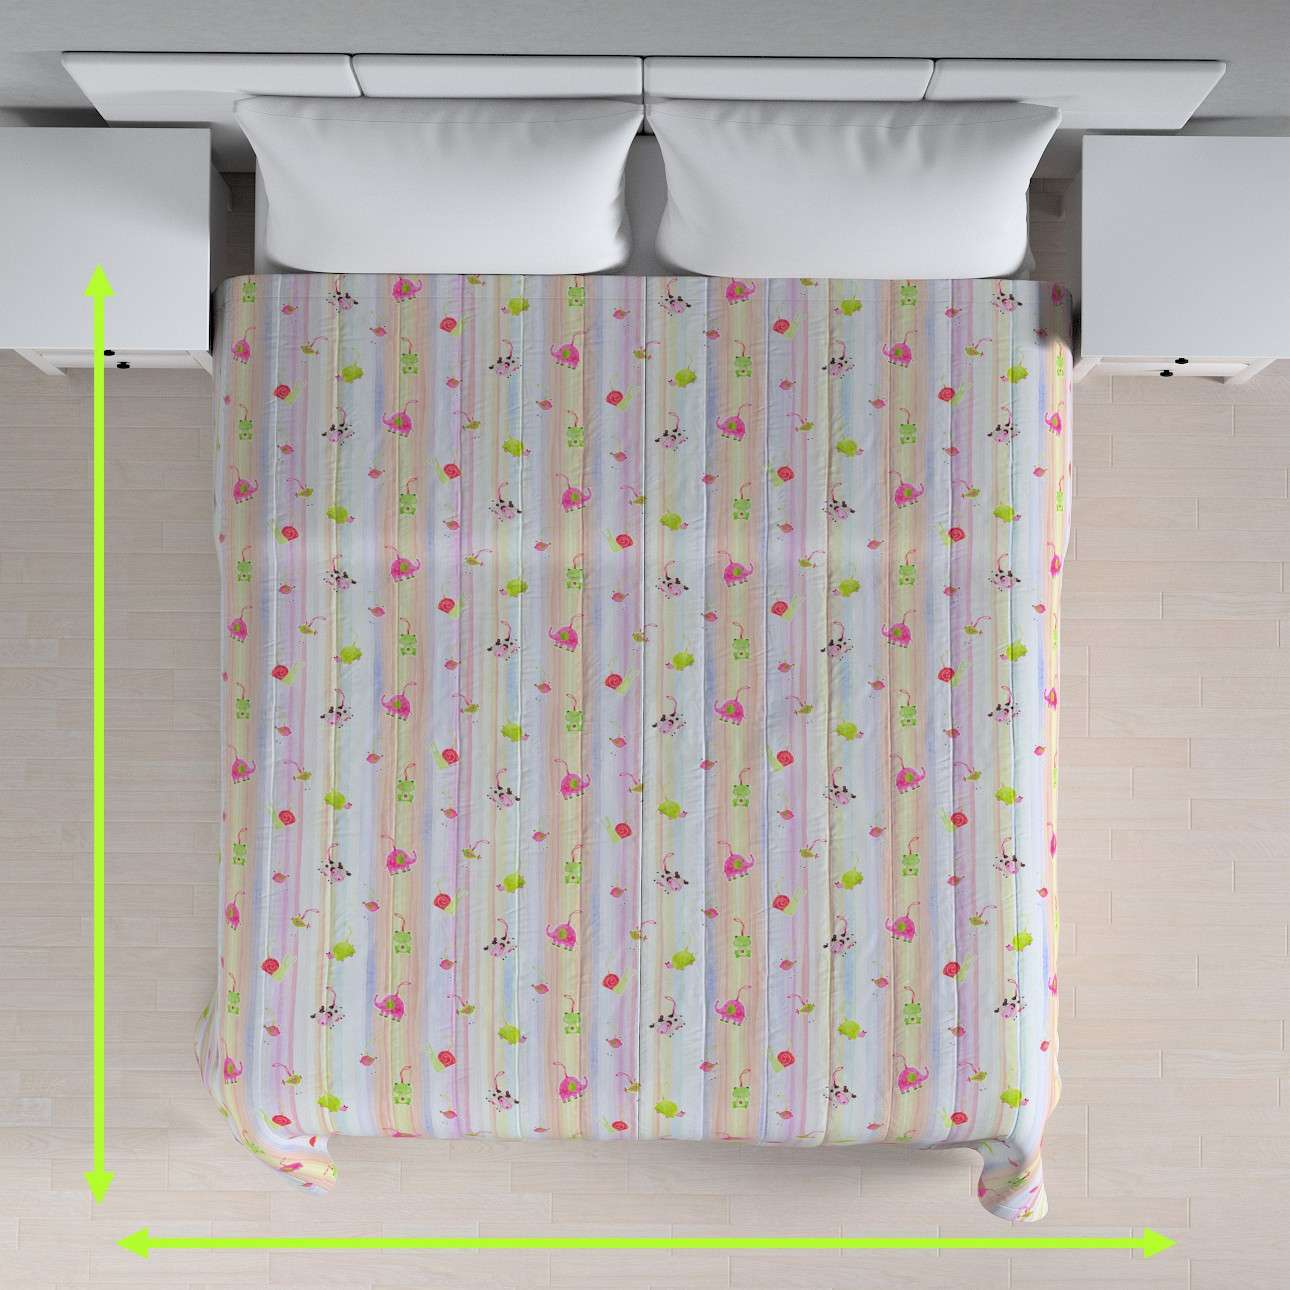 Prehoz na posteľ jednoduchý V kolekcii Little World, tkanina: 151-05